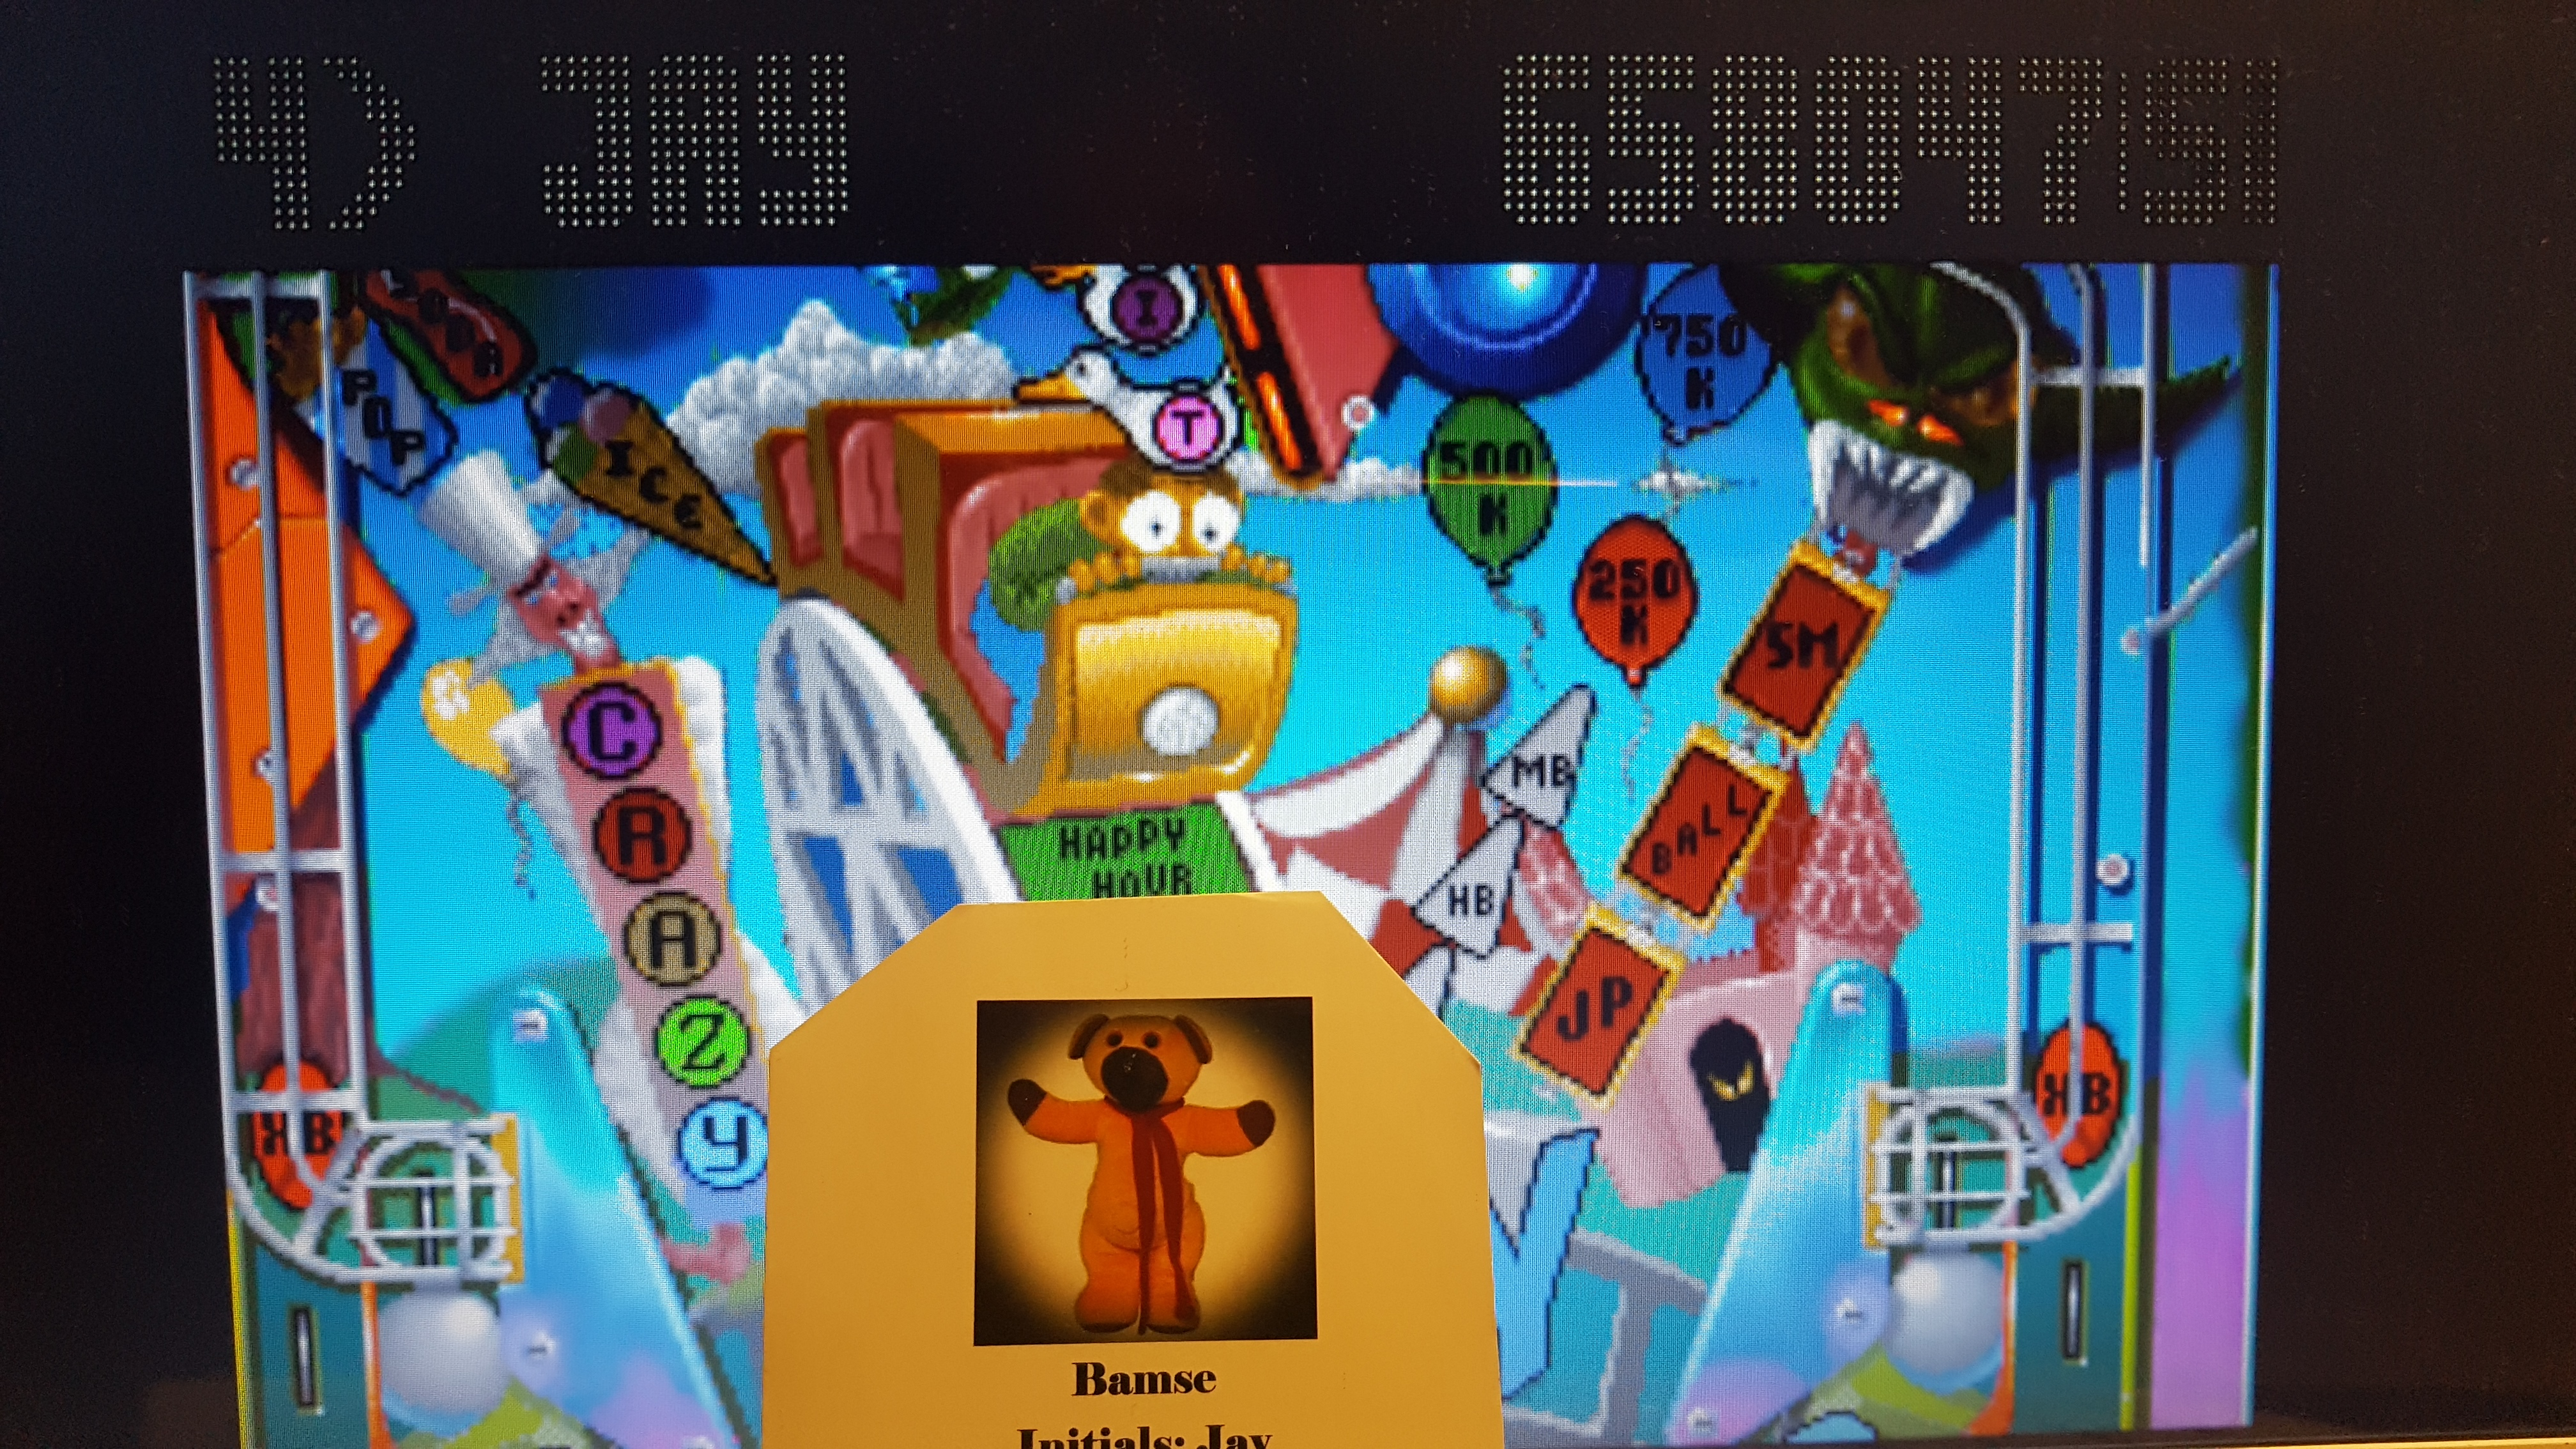 Bamse: Pinball Fantasies: Party Land (Atari Jaguar Emulated) 6,580,470 points on 2019-02-15 13:03:41